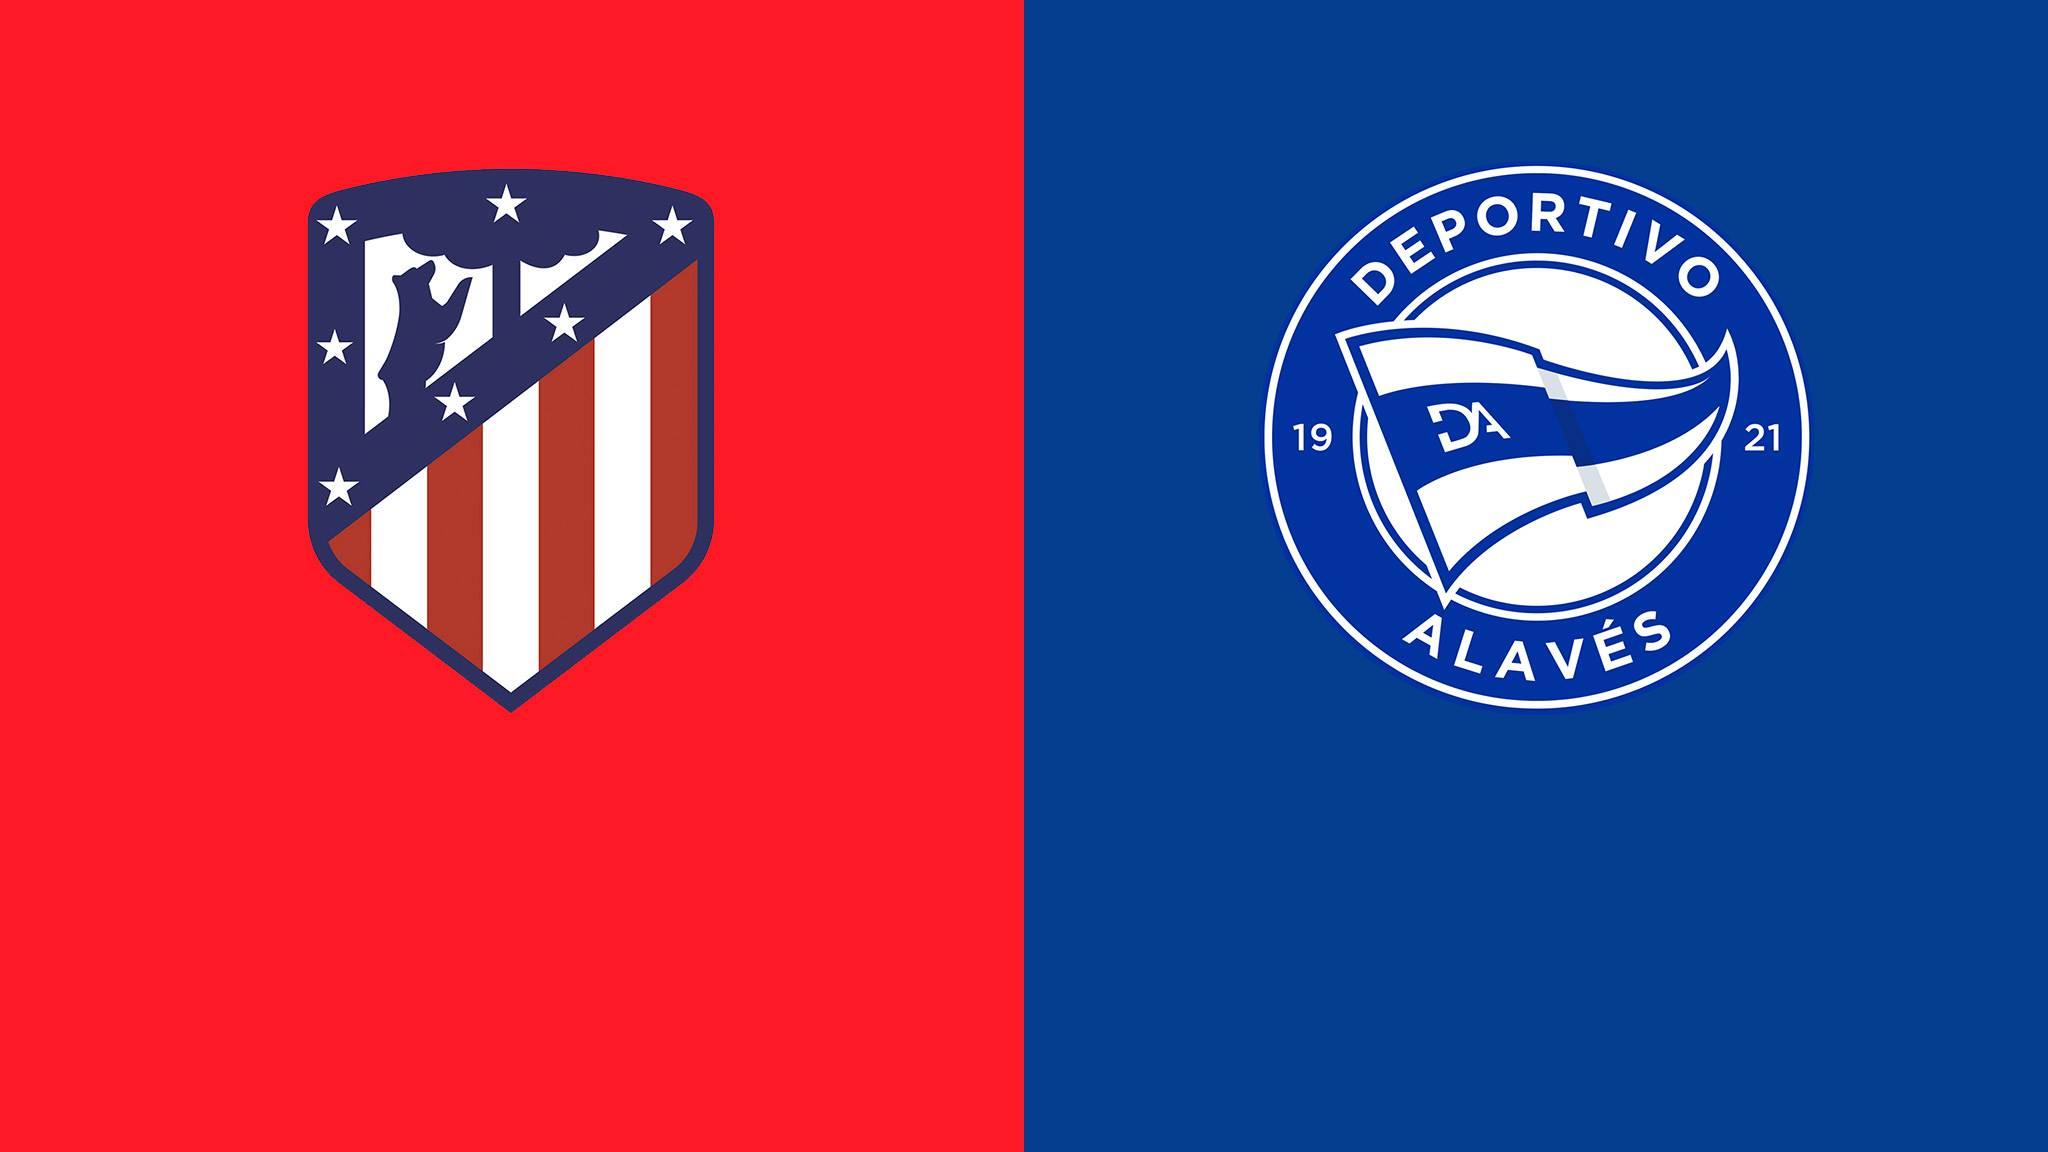 بث مباشر مباراة اتلتيكو مدريد والافيس